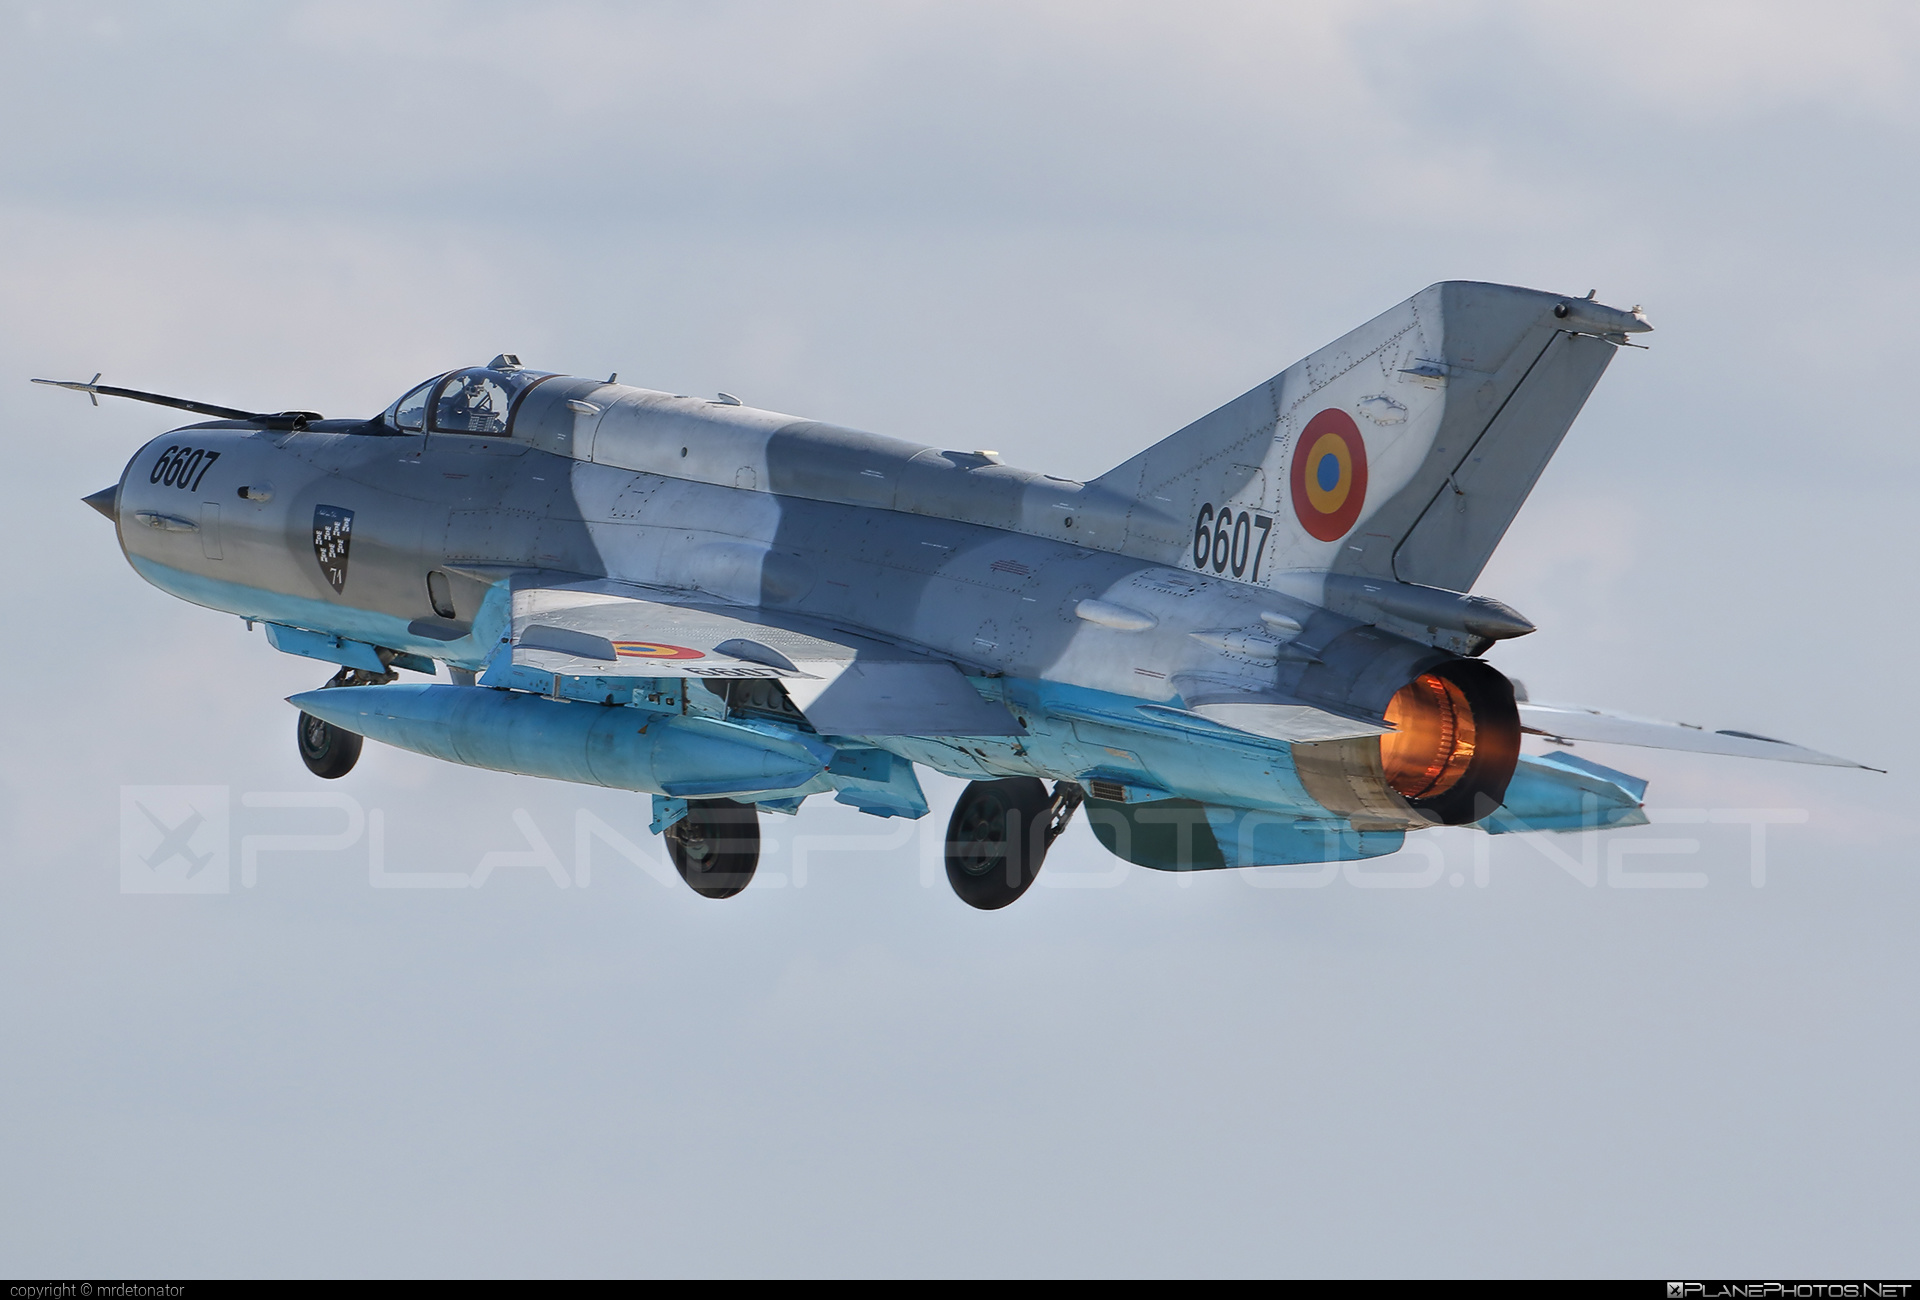 Mikoyan-Gurevich MiG-21MF - 6607 operated by Forţele Aeriene Române (Romanian Air Force) #forteleaerieneromane #mig #mig21 #mig21mf #mikoyangurevich #romanianairforce